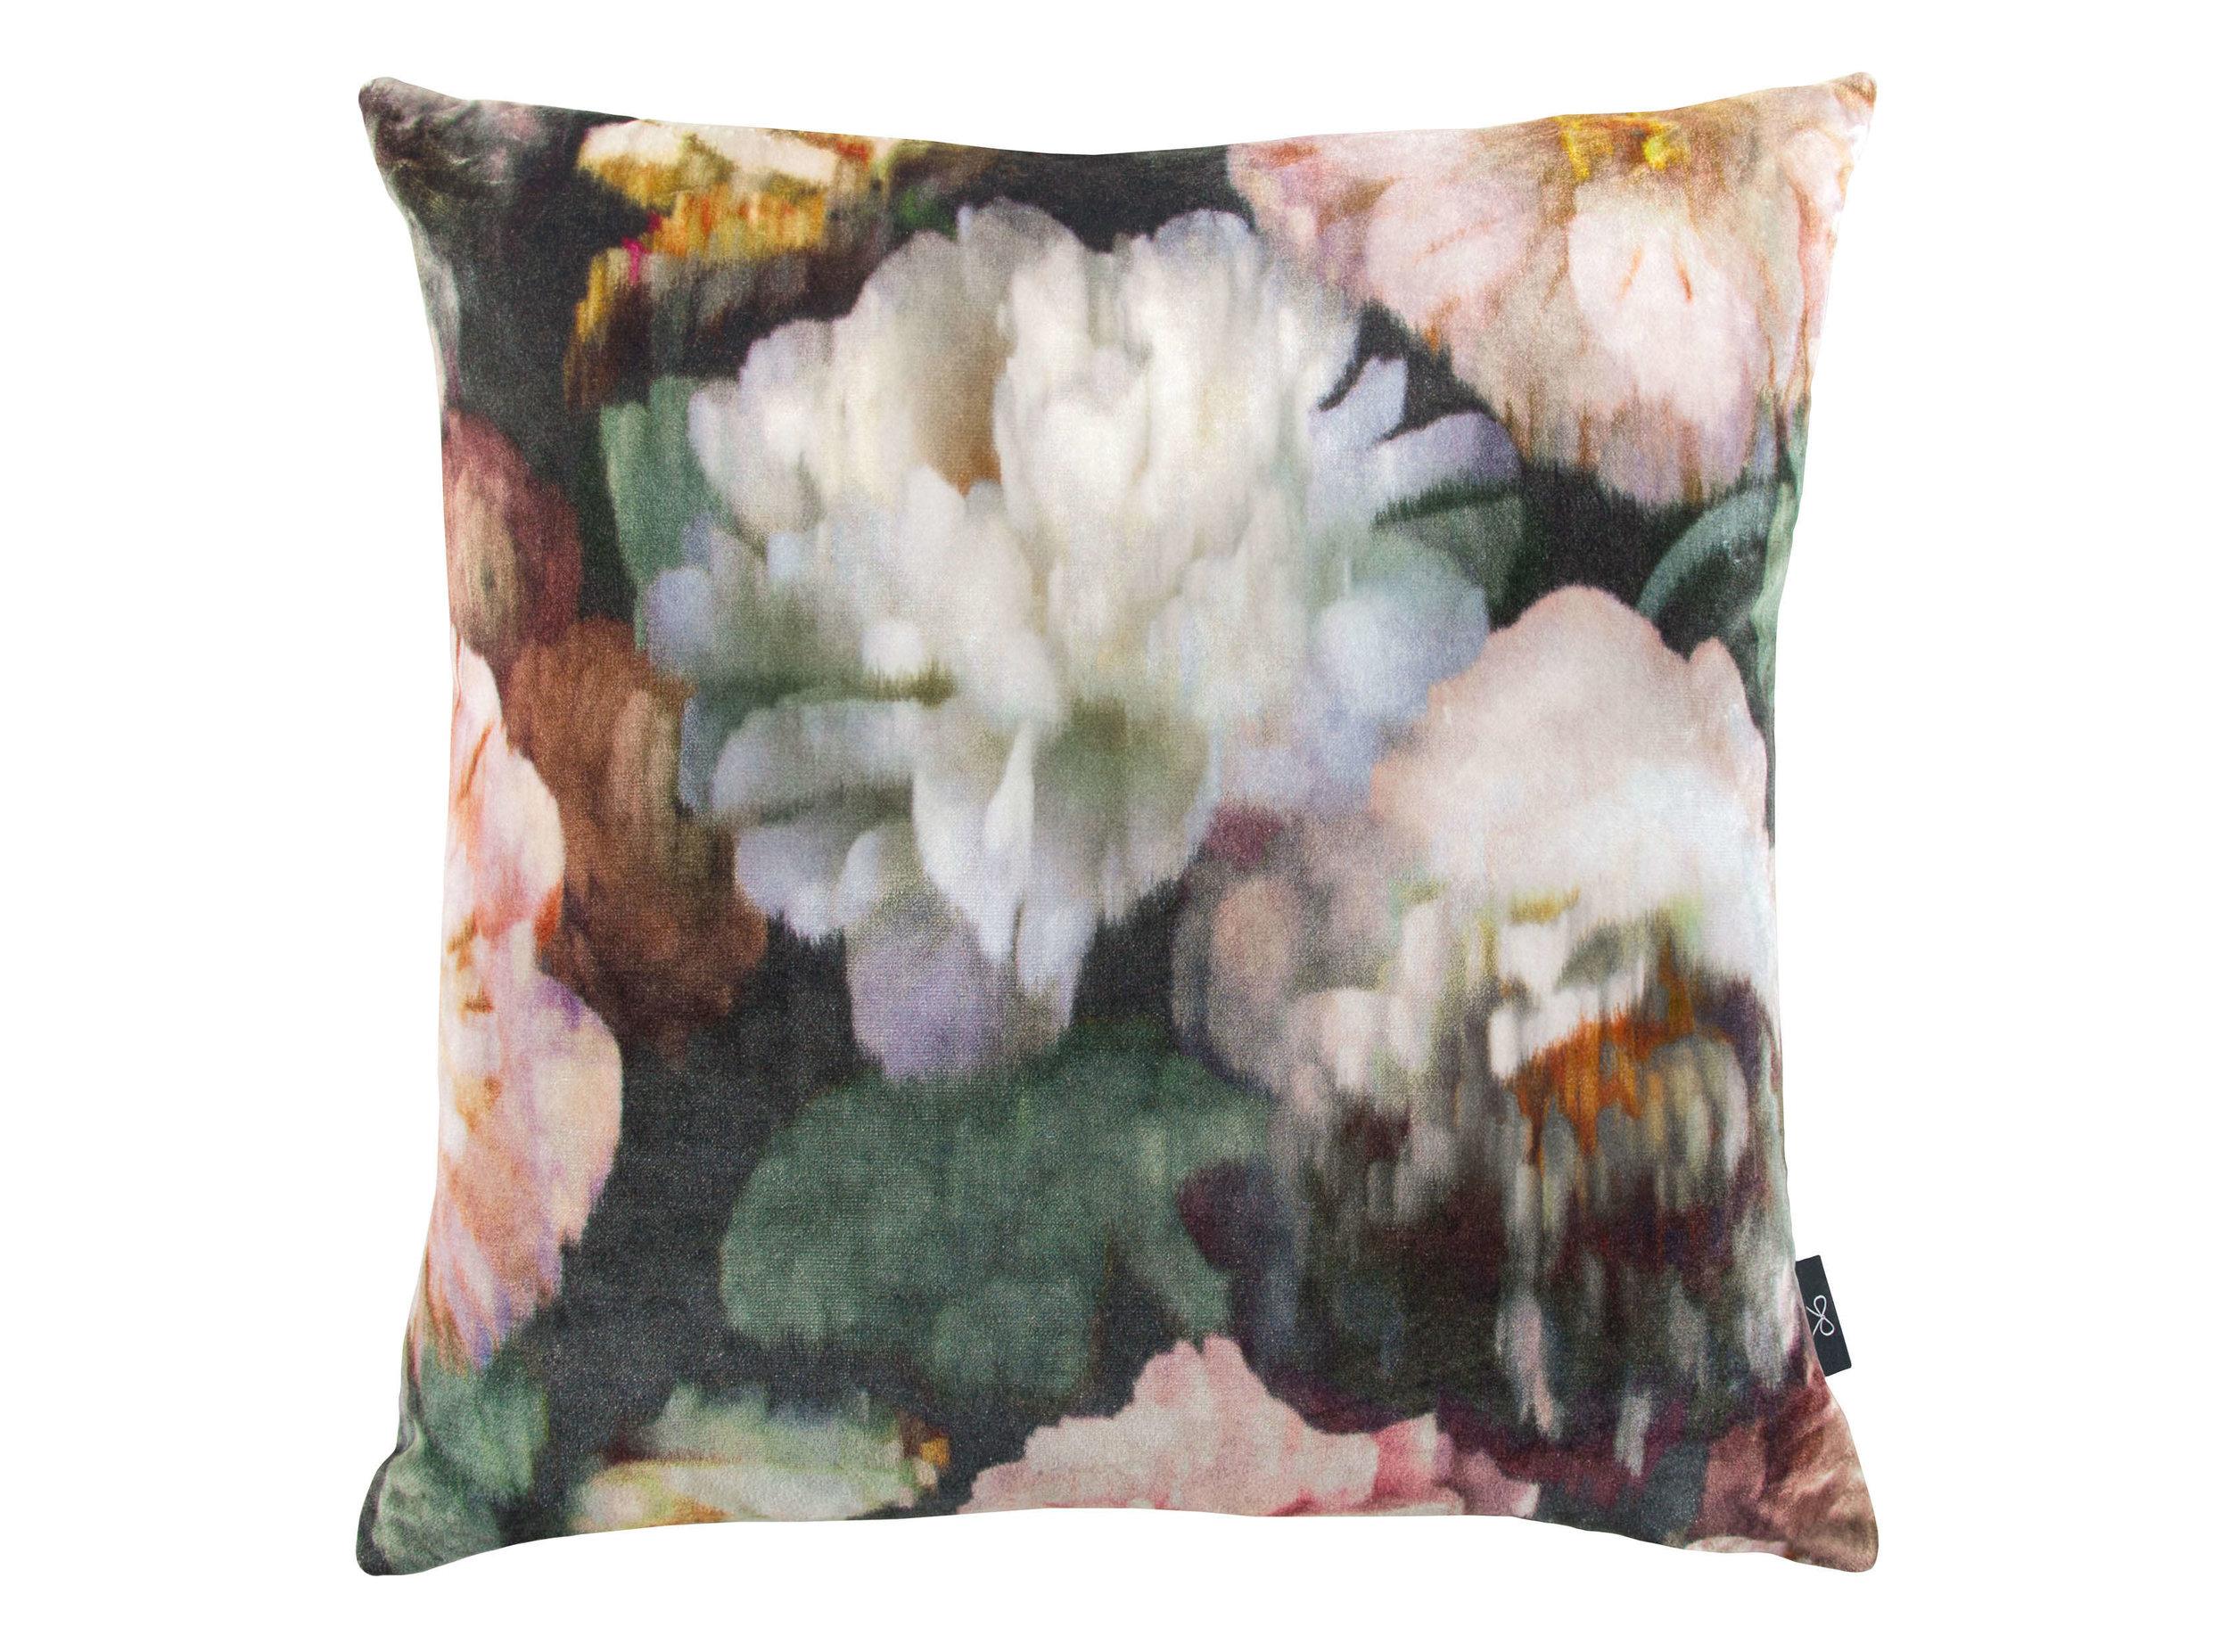 https://www.sweetpeaandwillow.com/accessories/cushions-throws/black-edition-herbaria-cushion-malva